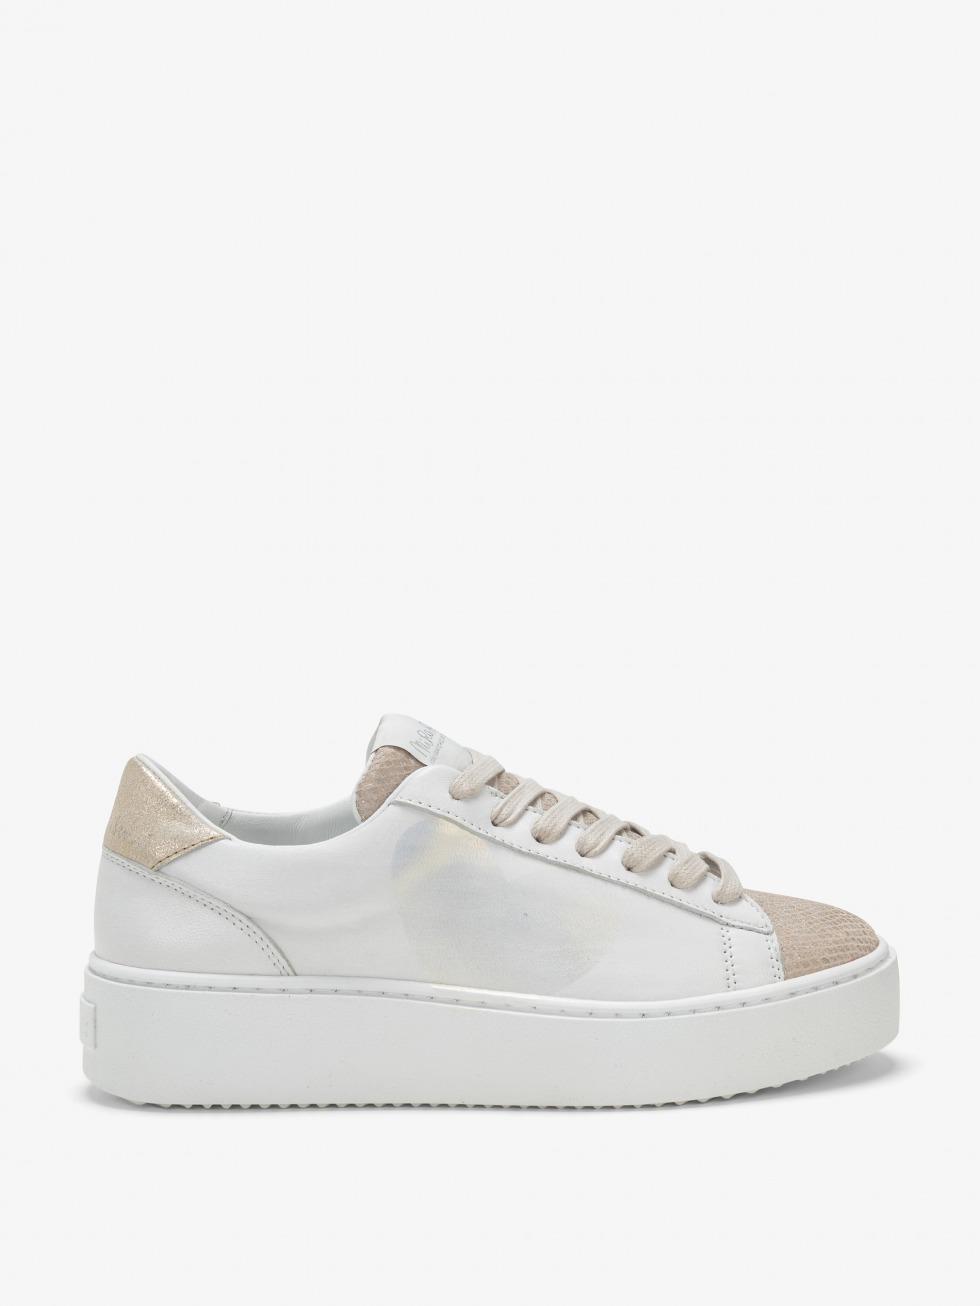 Cosmopolitan Sneakers Platinum Blanched - Heart